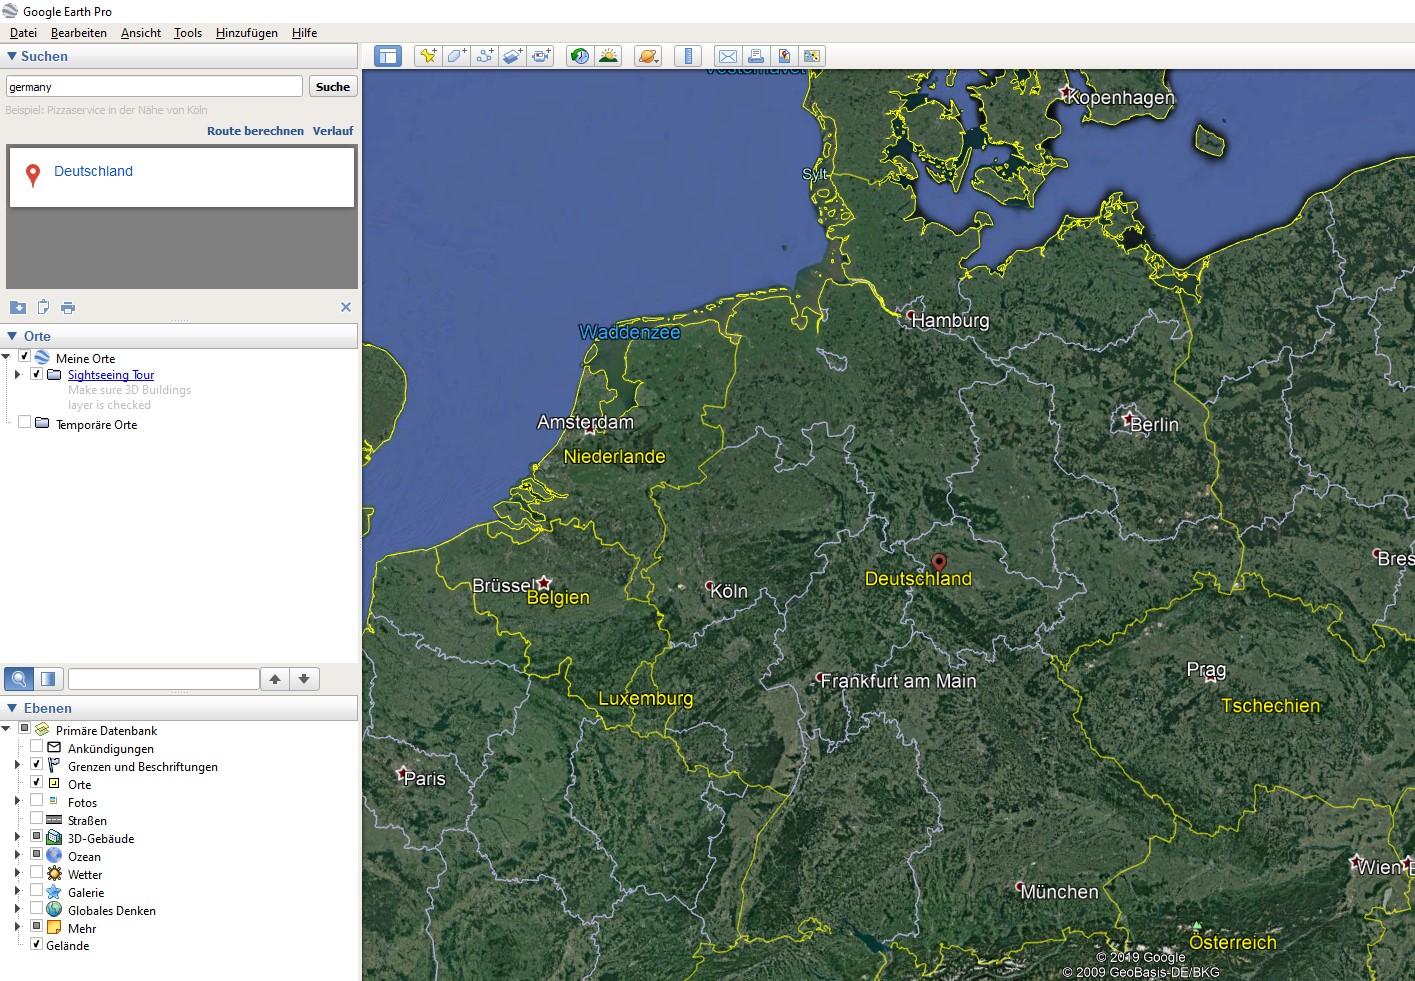 Google Earth Pro-Benutzeroberfläche